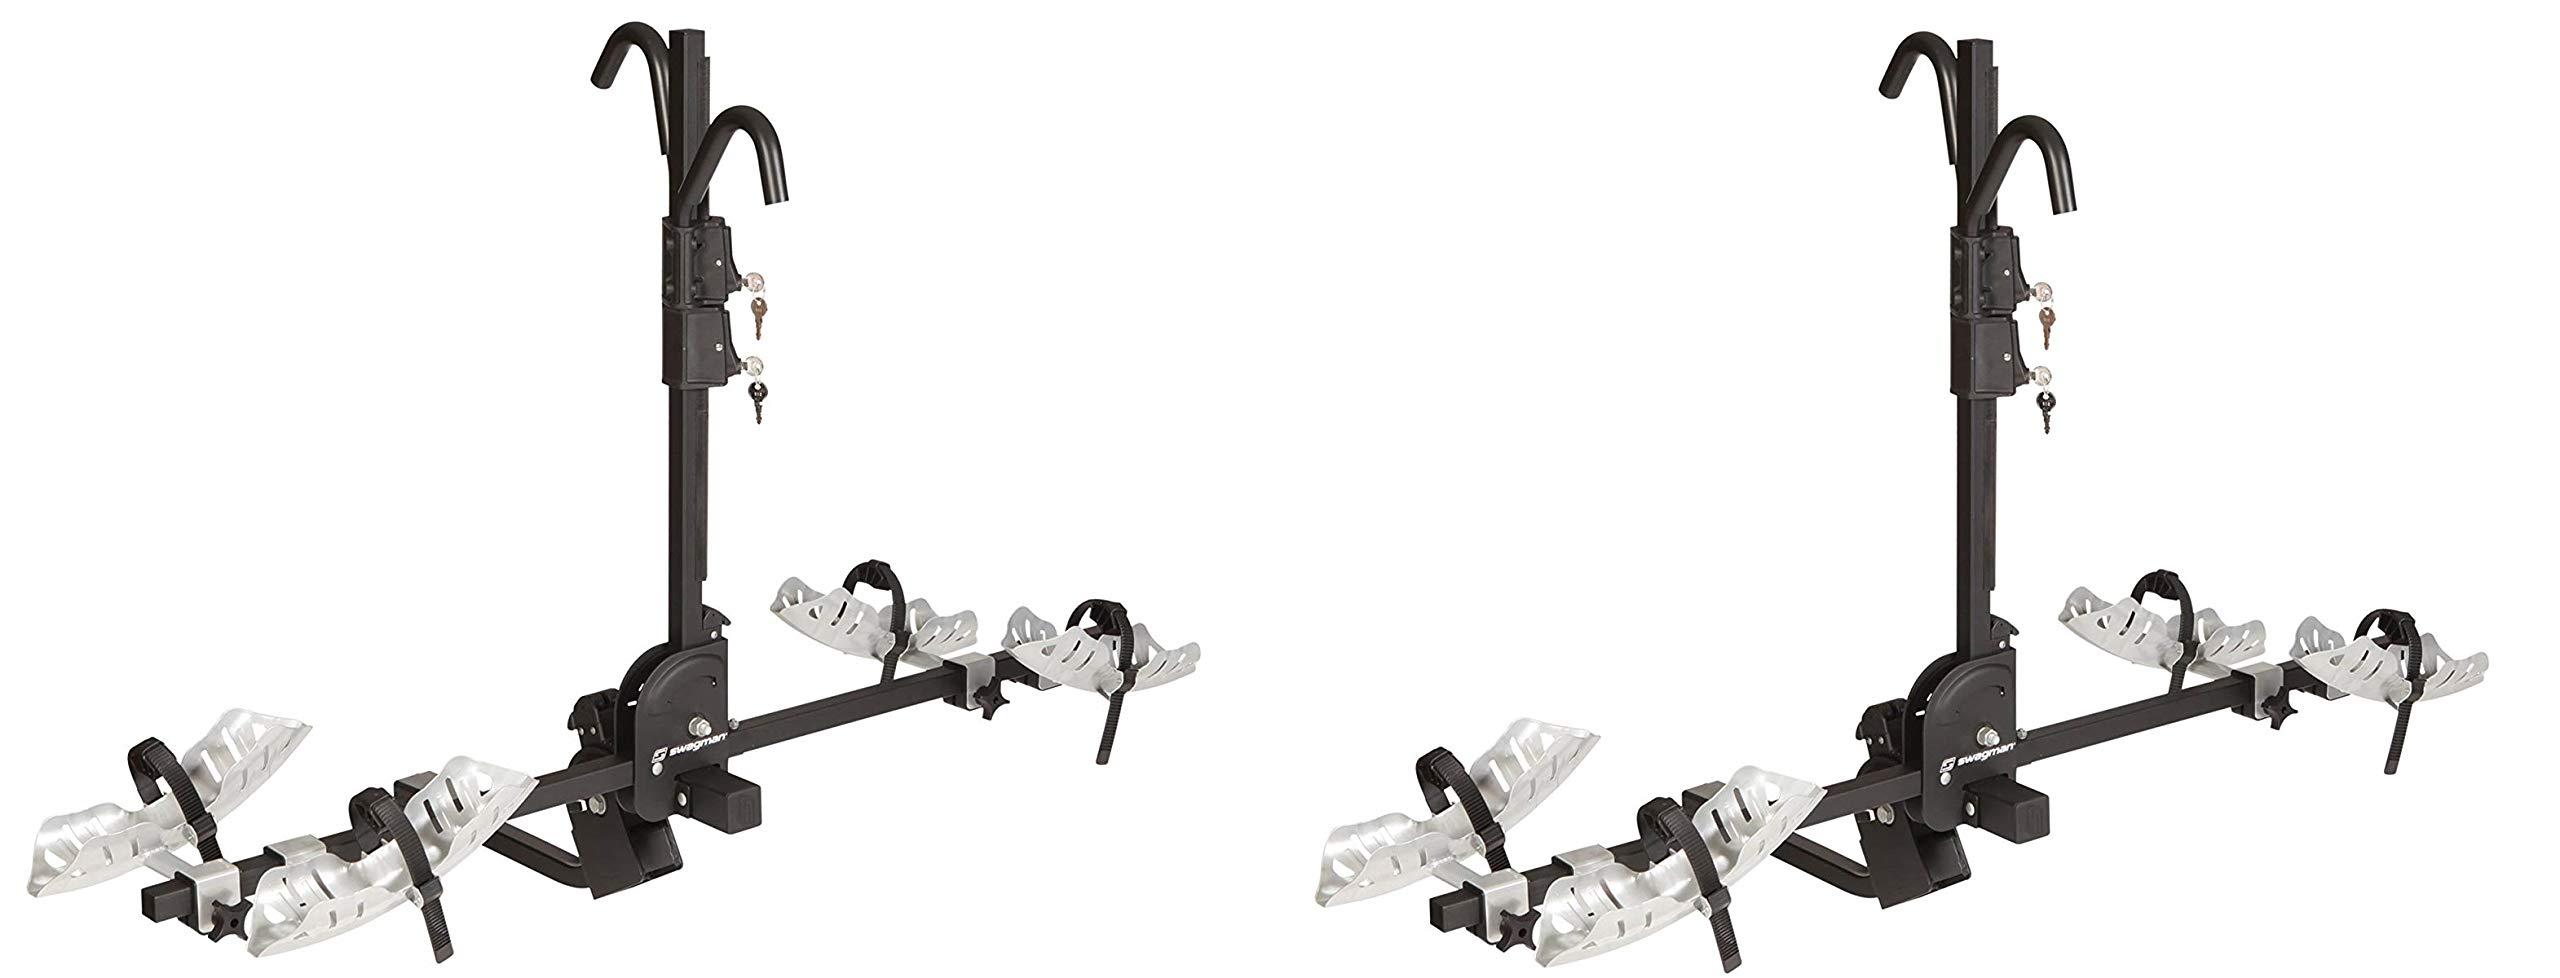 Swagman Chinook Hitch Bike Rack (Pack of 2)